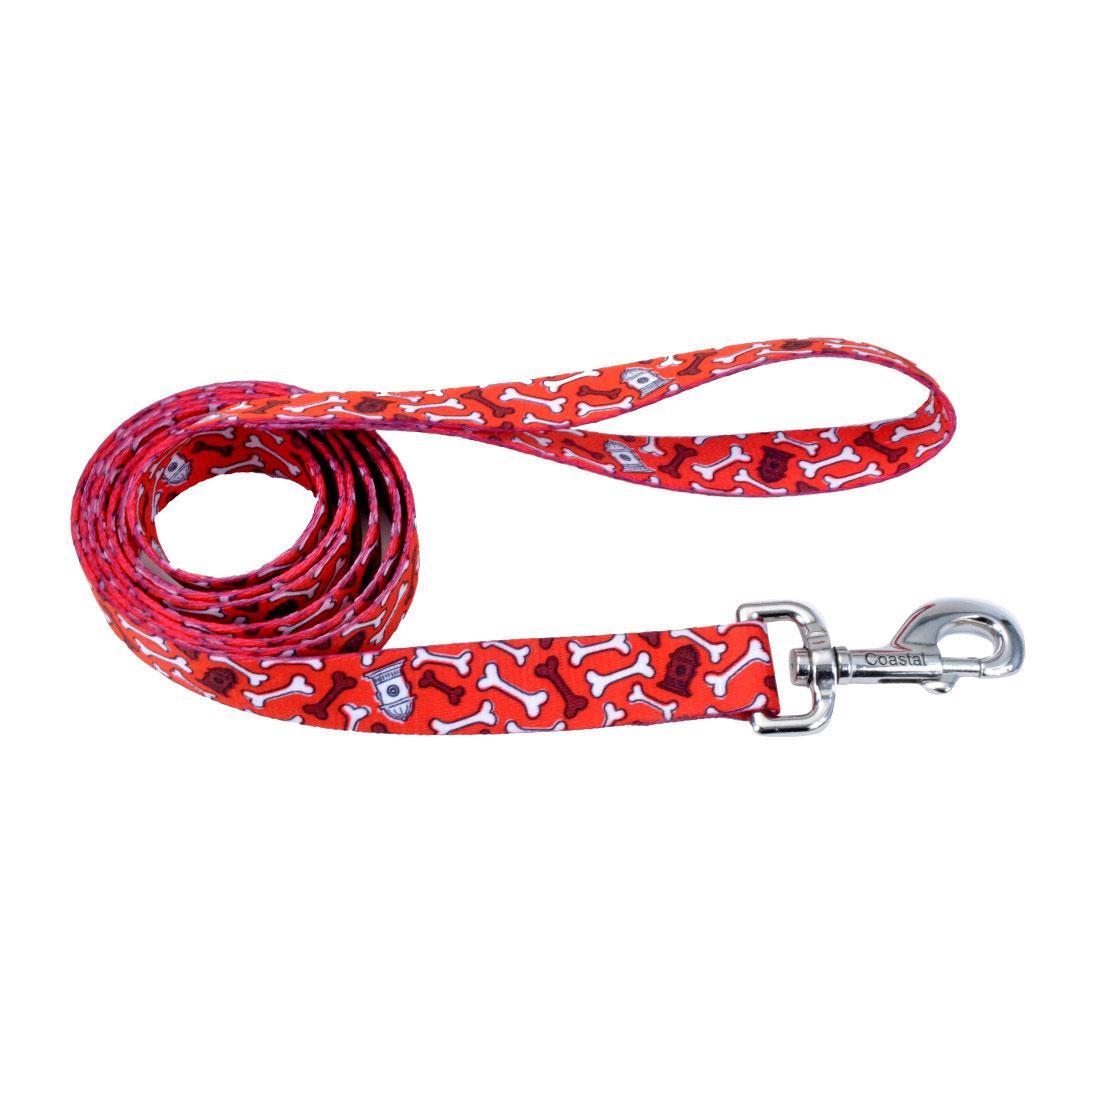 Styles Dog Leash, Red Bones Image